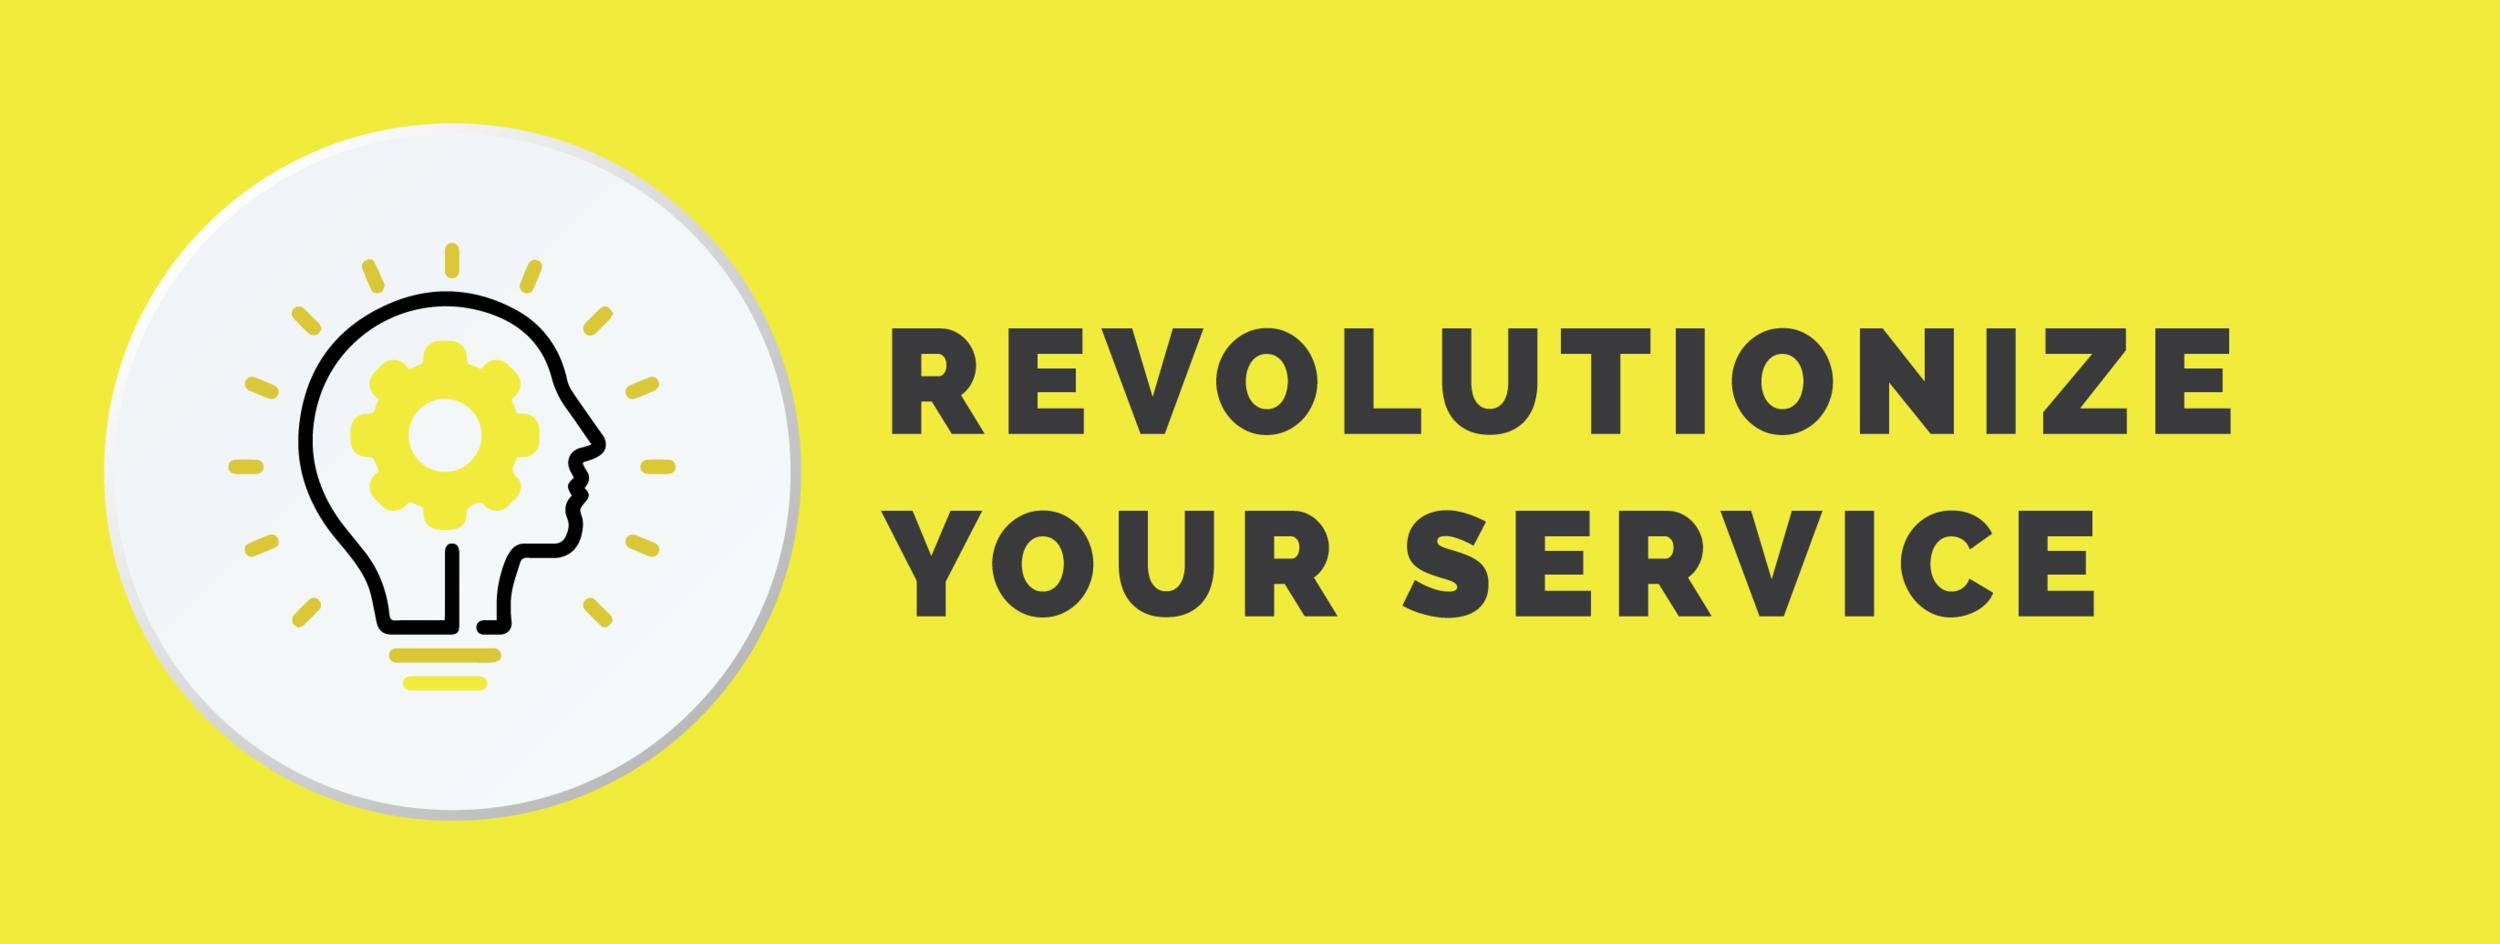 Revolutionize your service.